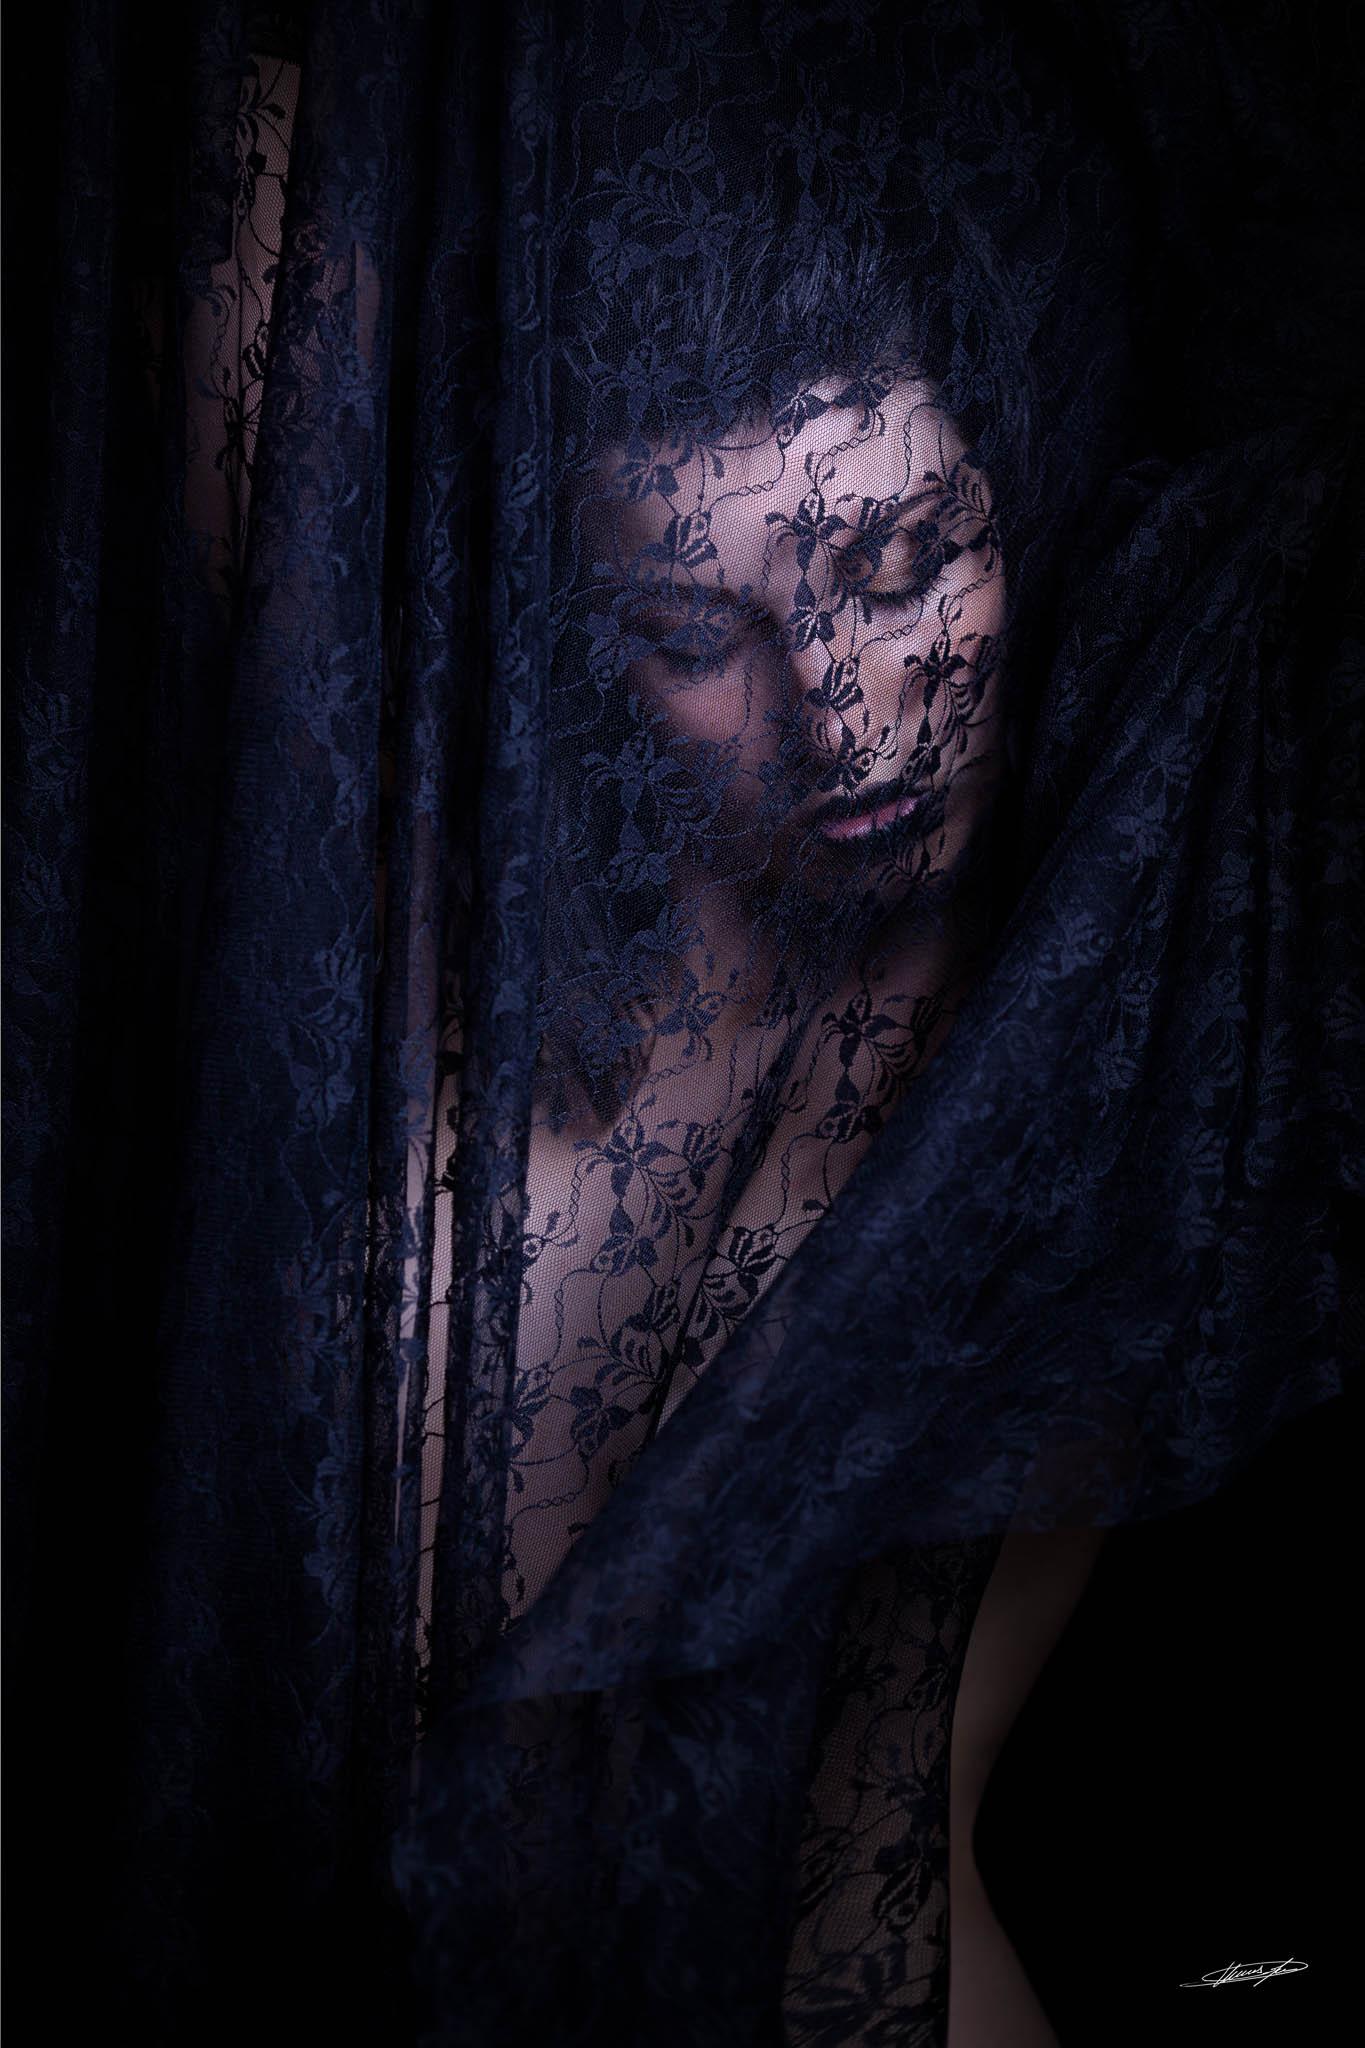 VENUS Gallery - Thomas Capasso Photography